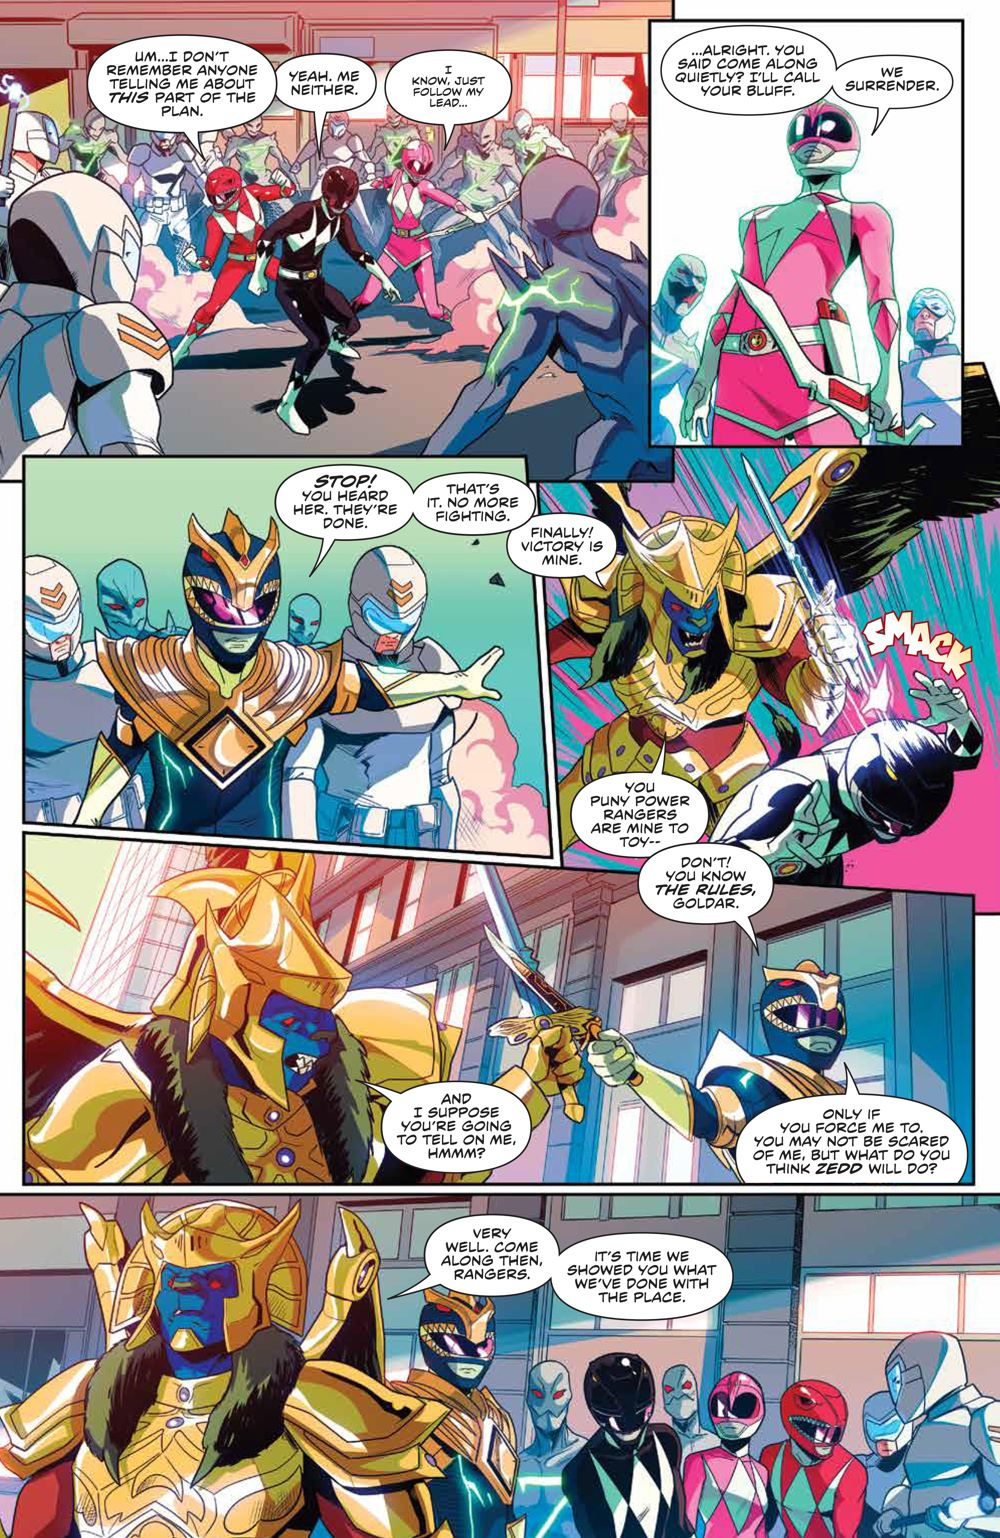 MightyMorphin_007_PRESS_8 ComicList Previews: MIGHTY MORPHIN #7